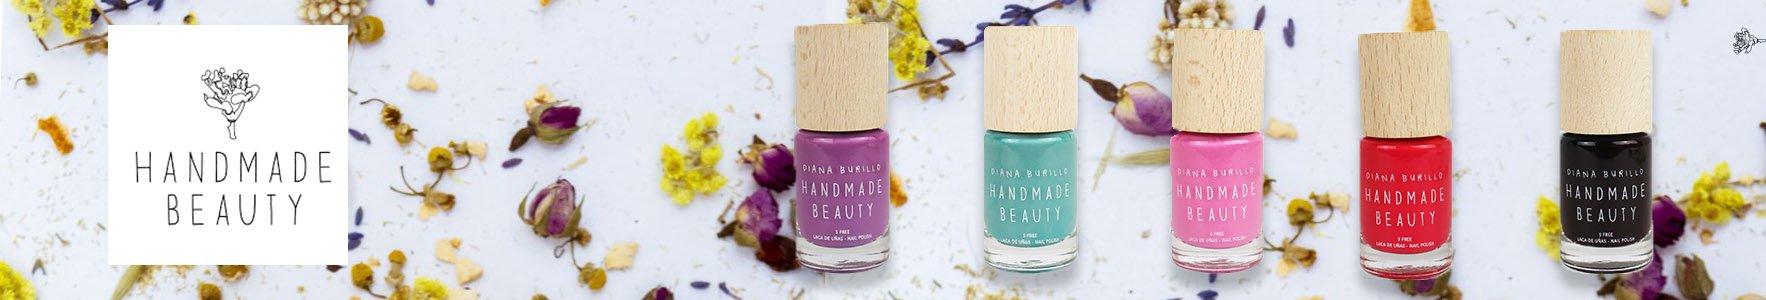 Handmade Beauty